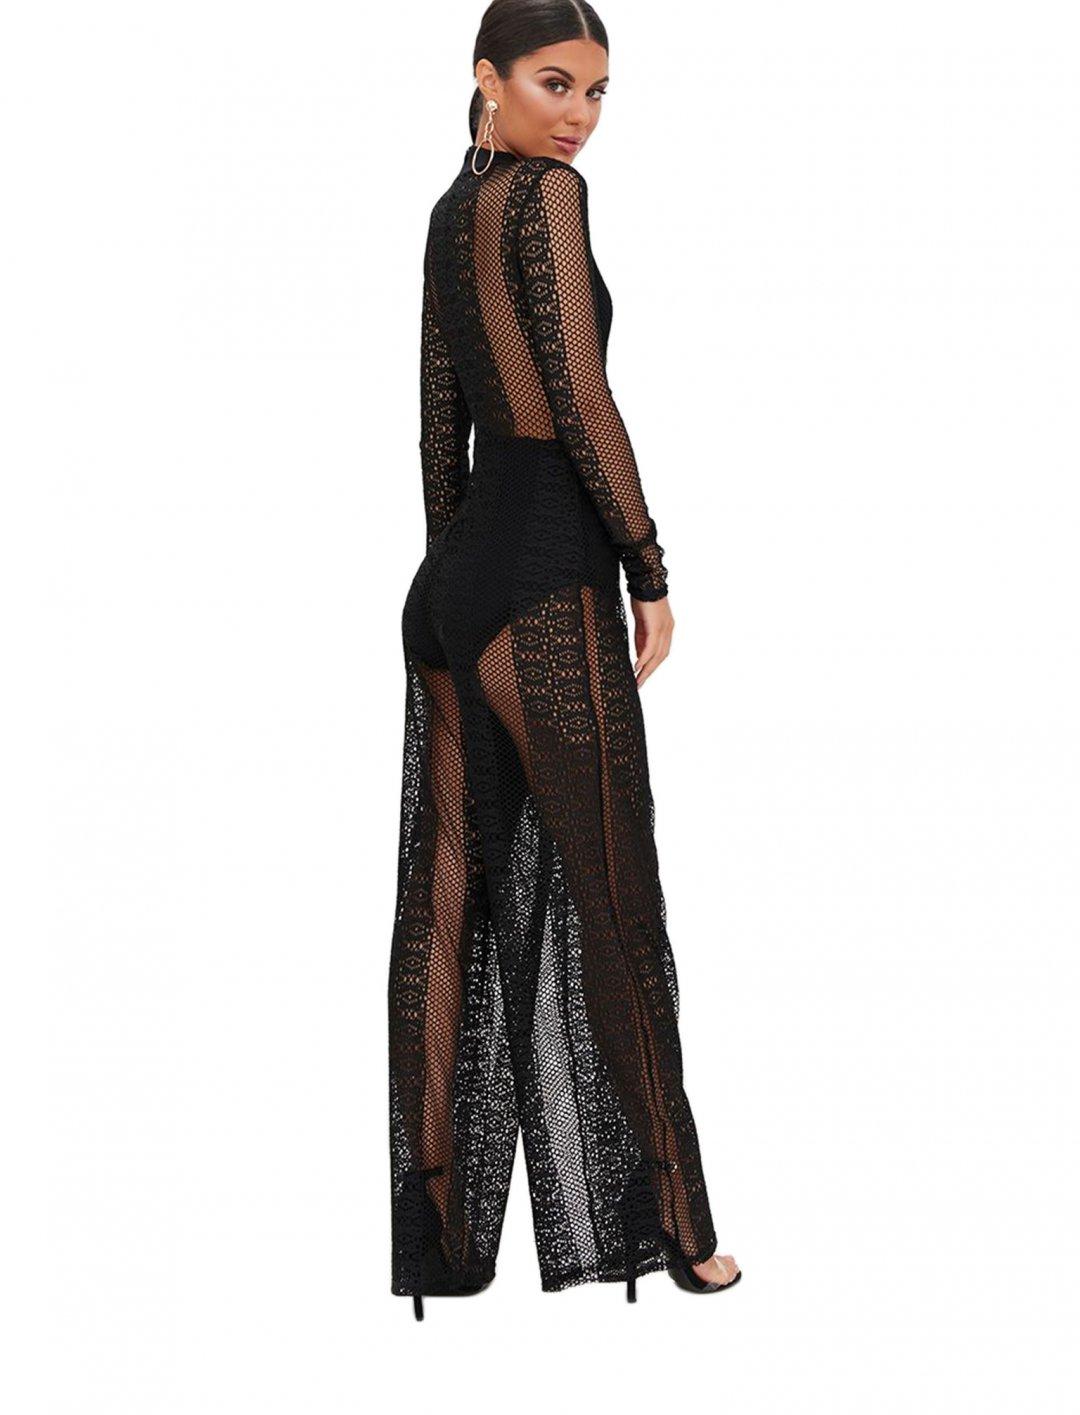 2334fae725 Dress Lace Lace Jumpsuit Lace Dress Zara Raveitsafe Zara Jumpsuit ...